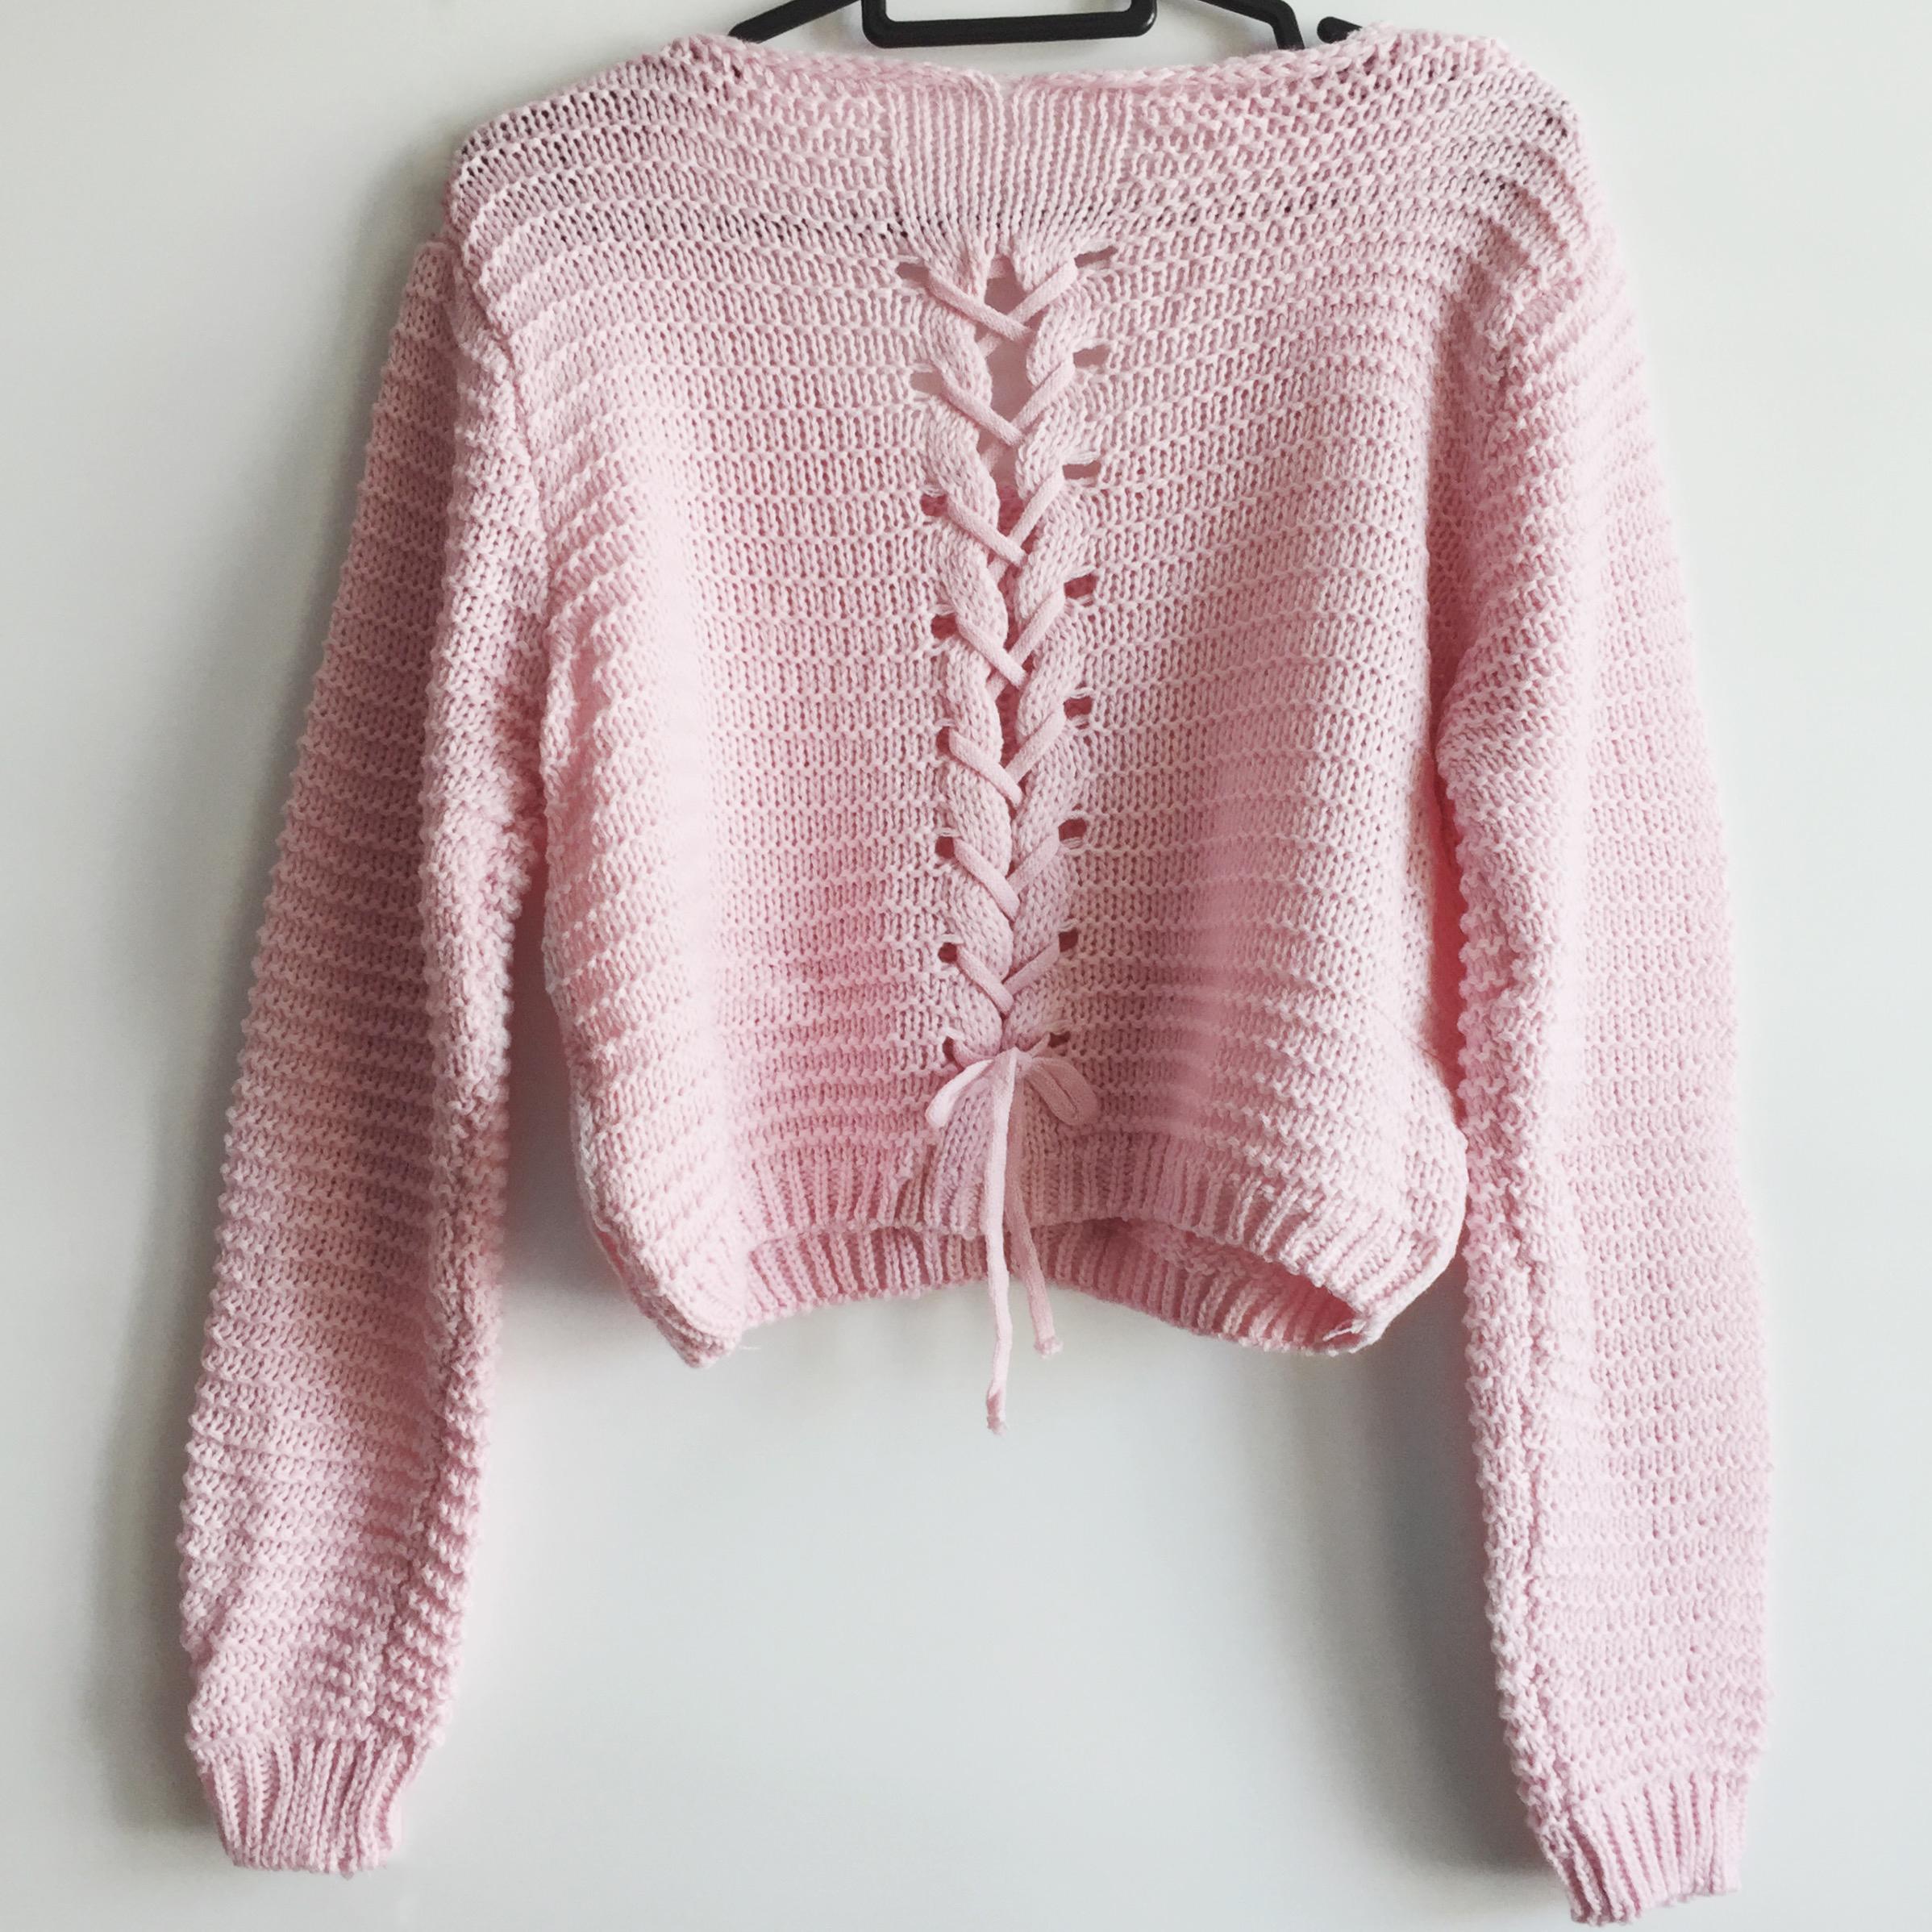 Lace Up Back Cropped Knit Sweater (Pink) · Megoosta Fashion · Free ...